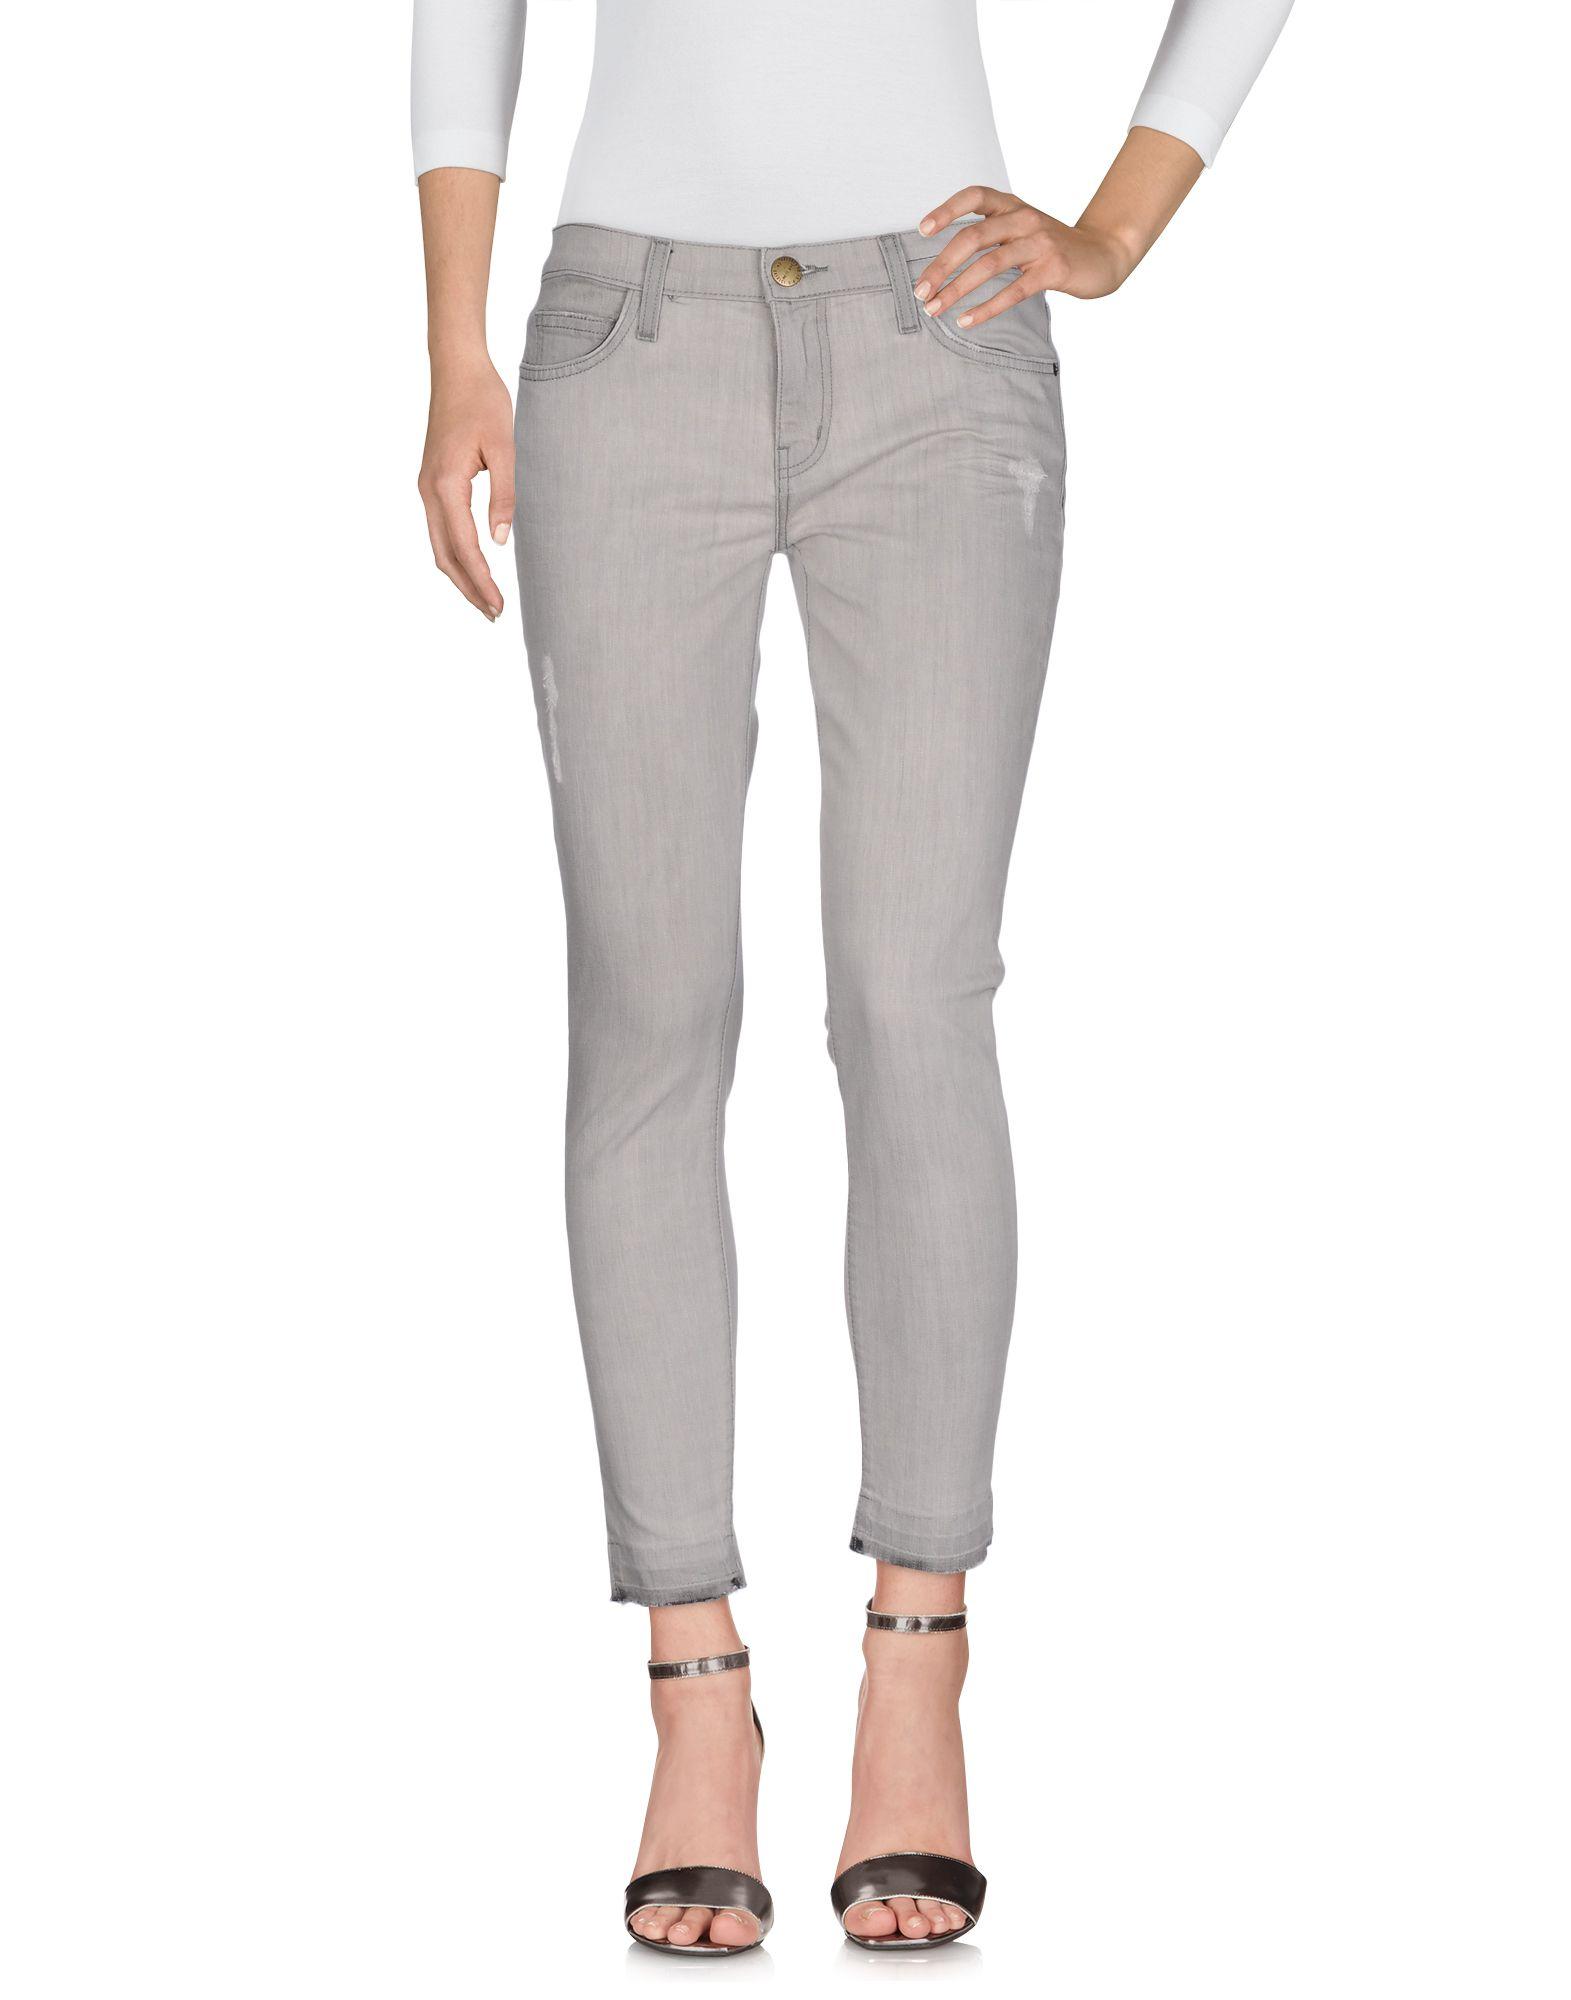 Pantaloni Jeans Current/Elliott Donna - Acquista online su YJtMO